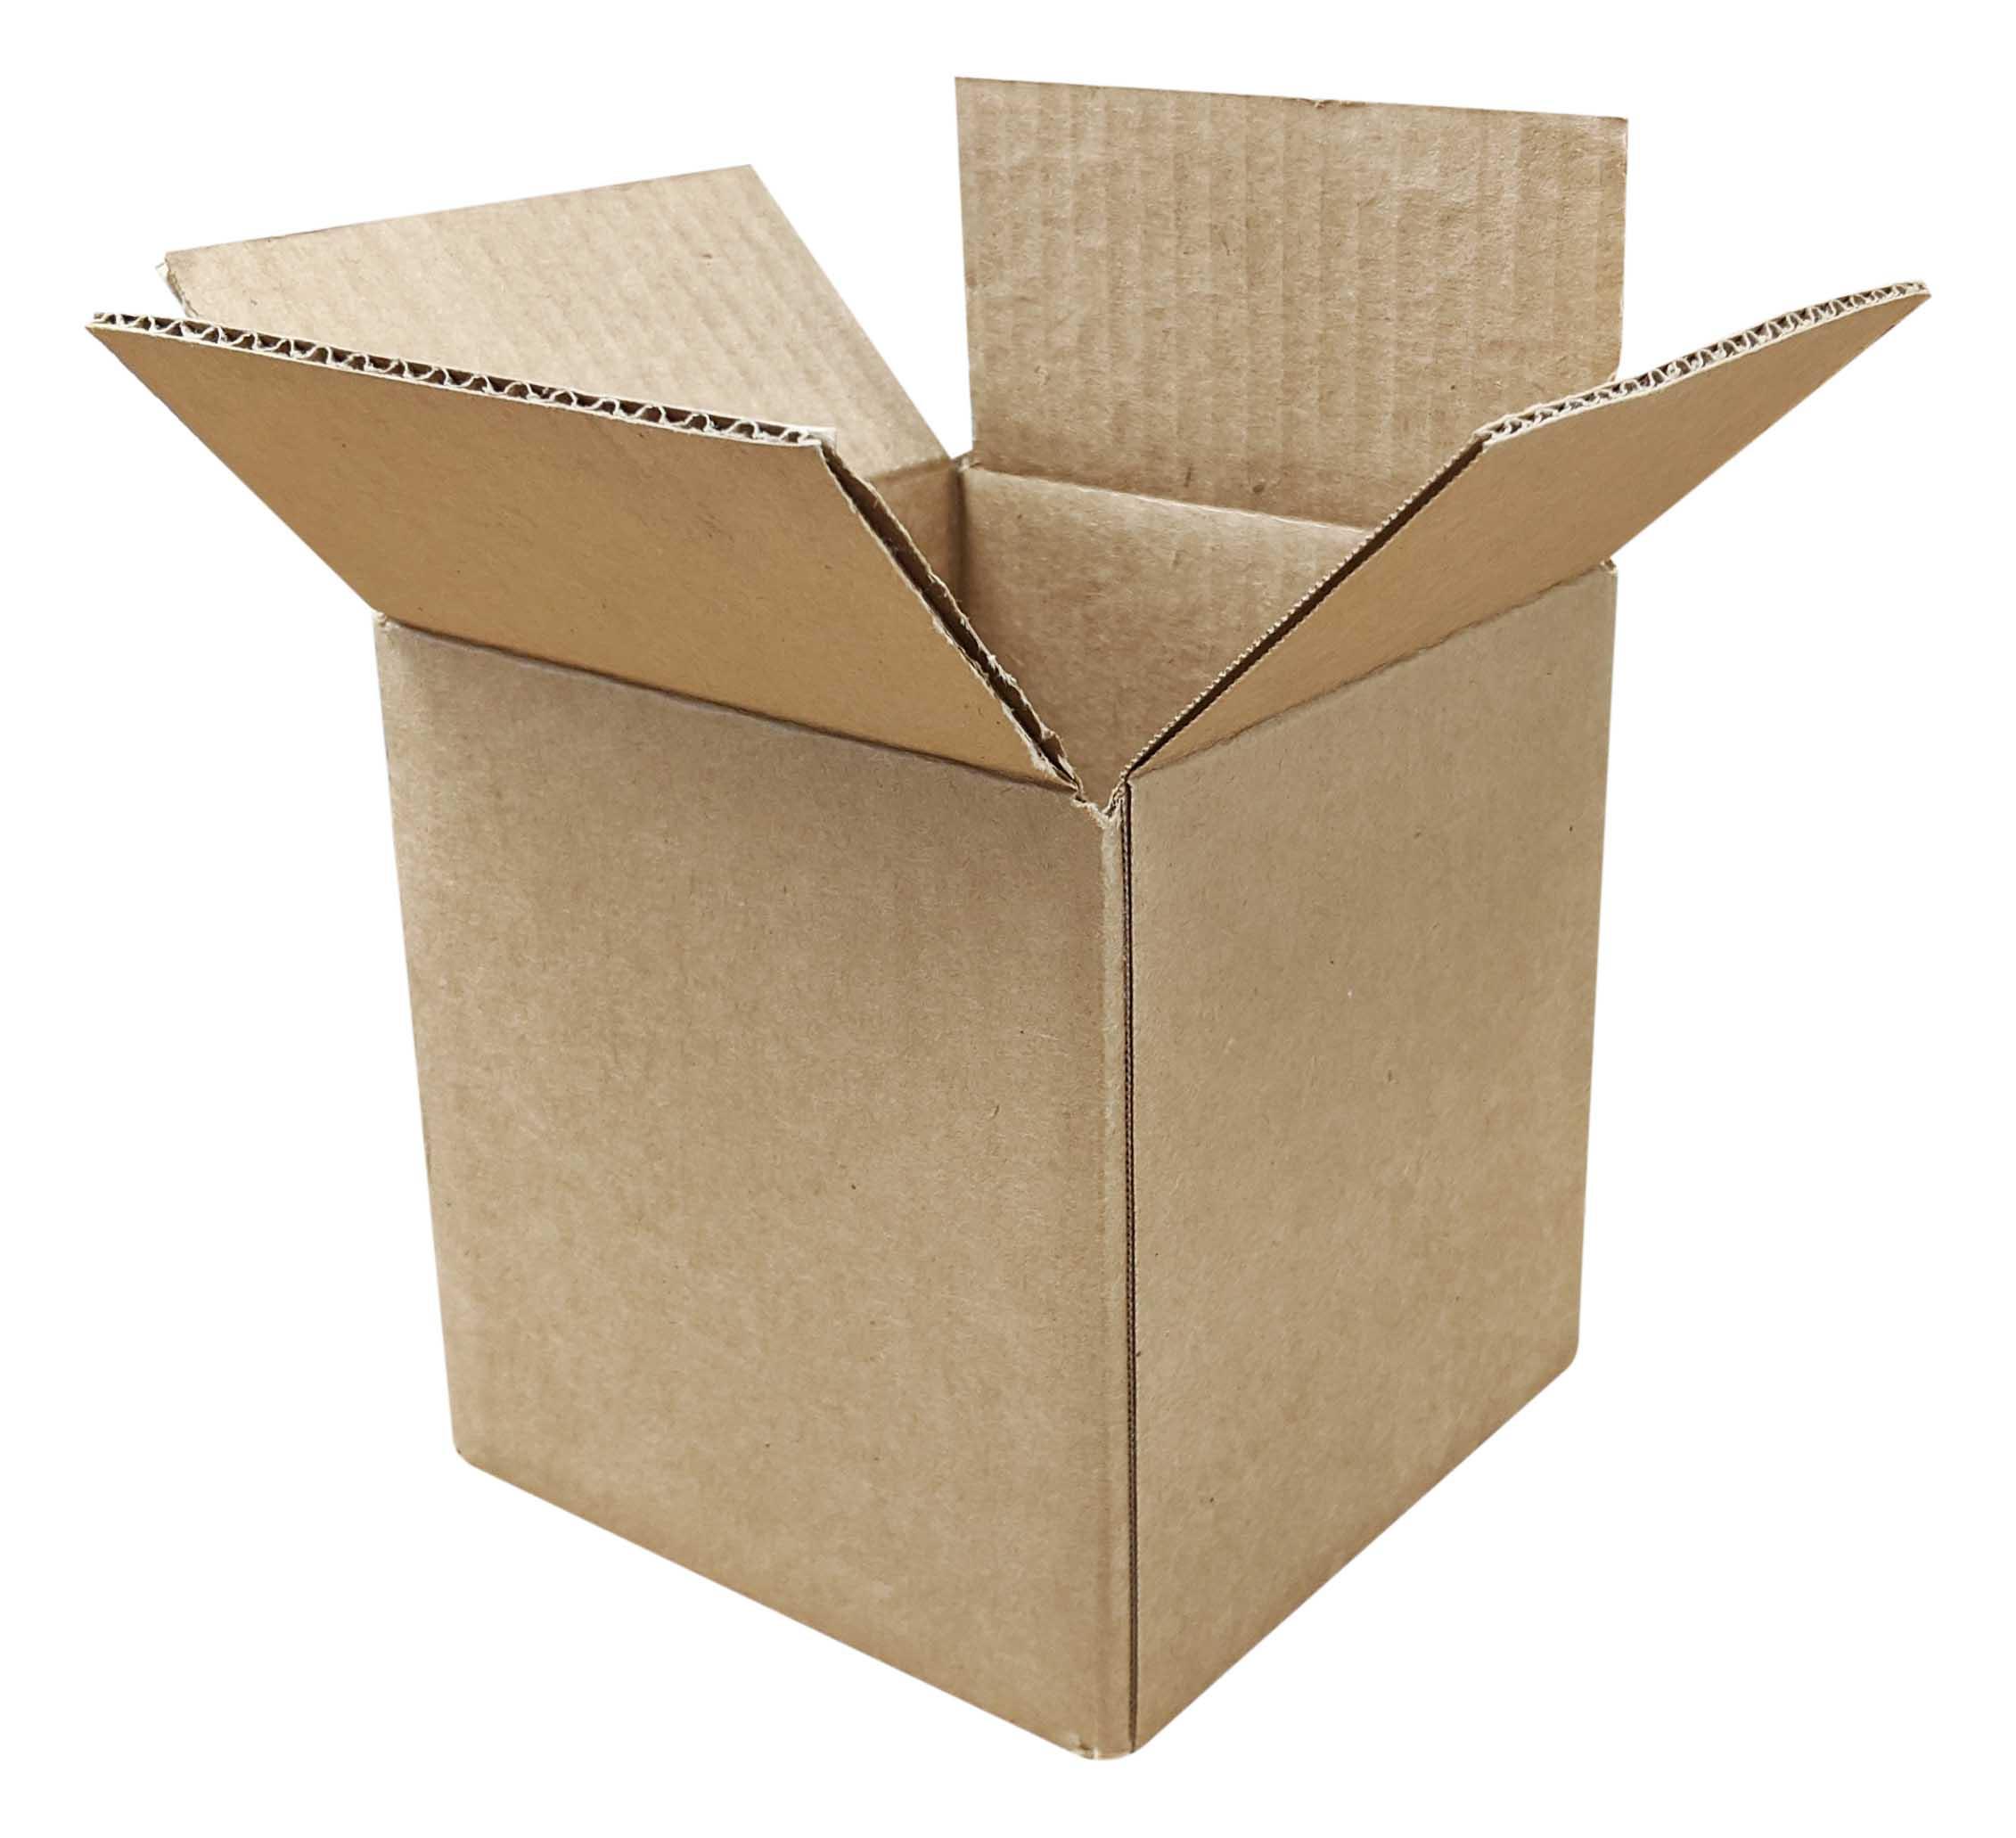 Boxes – Corrugated